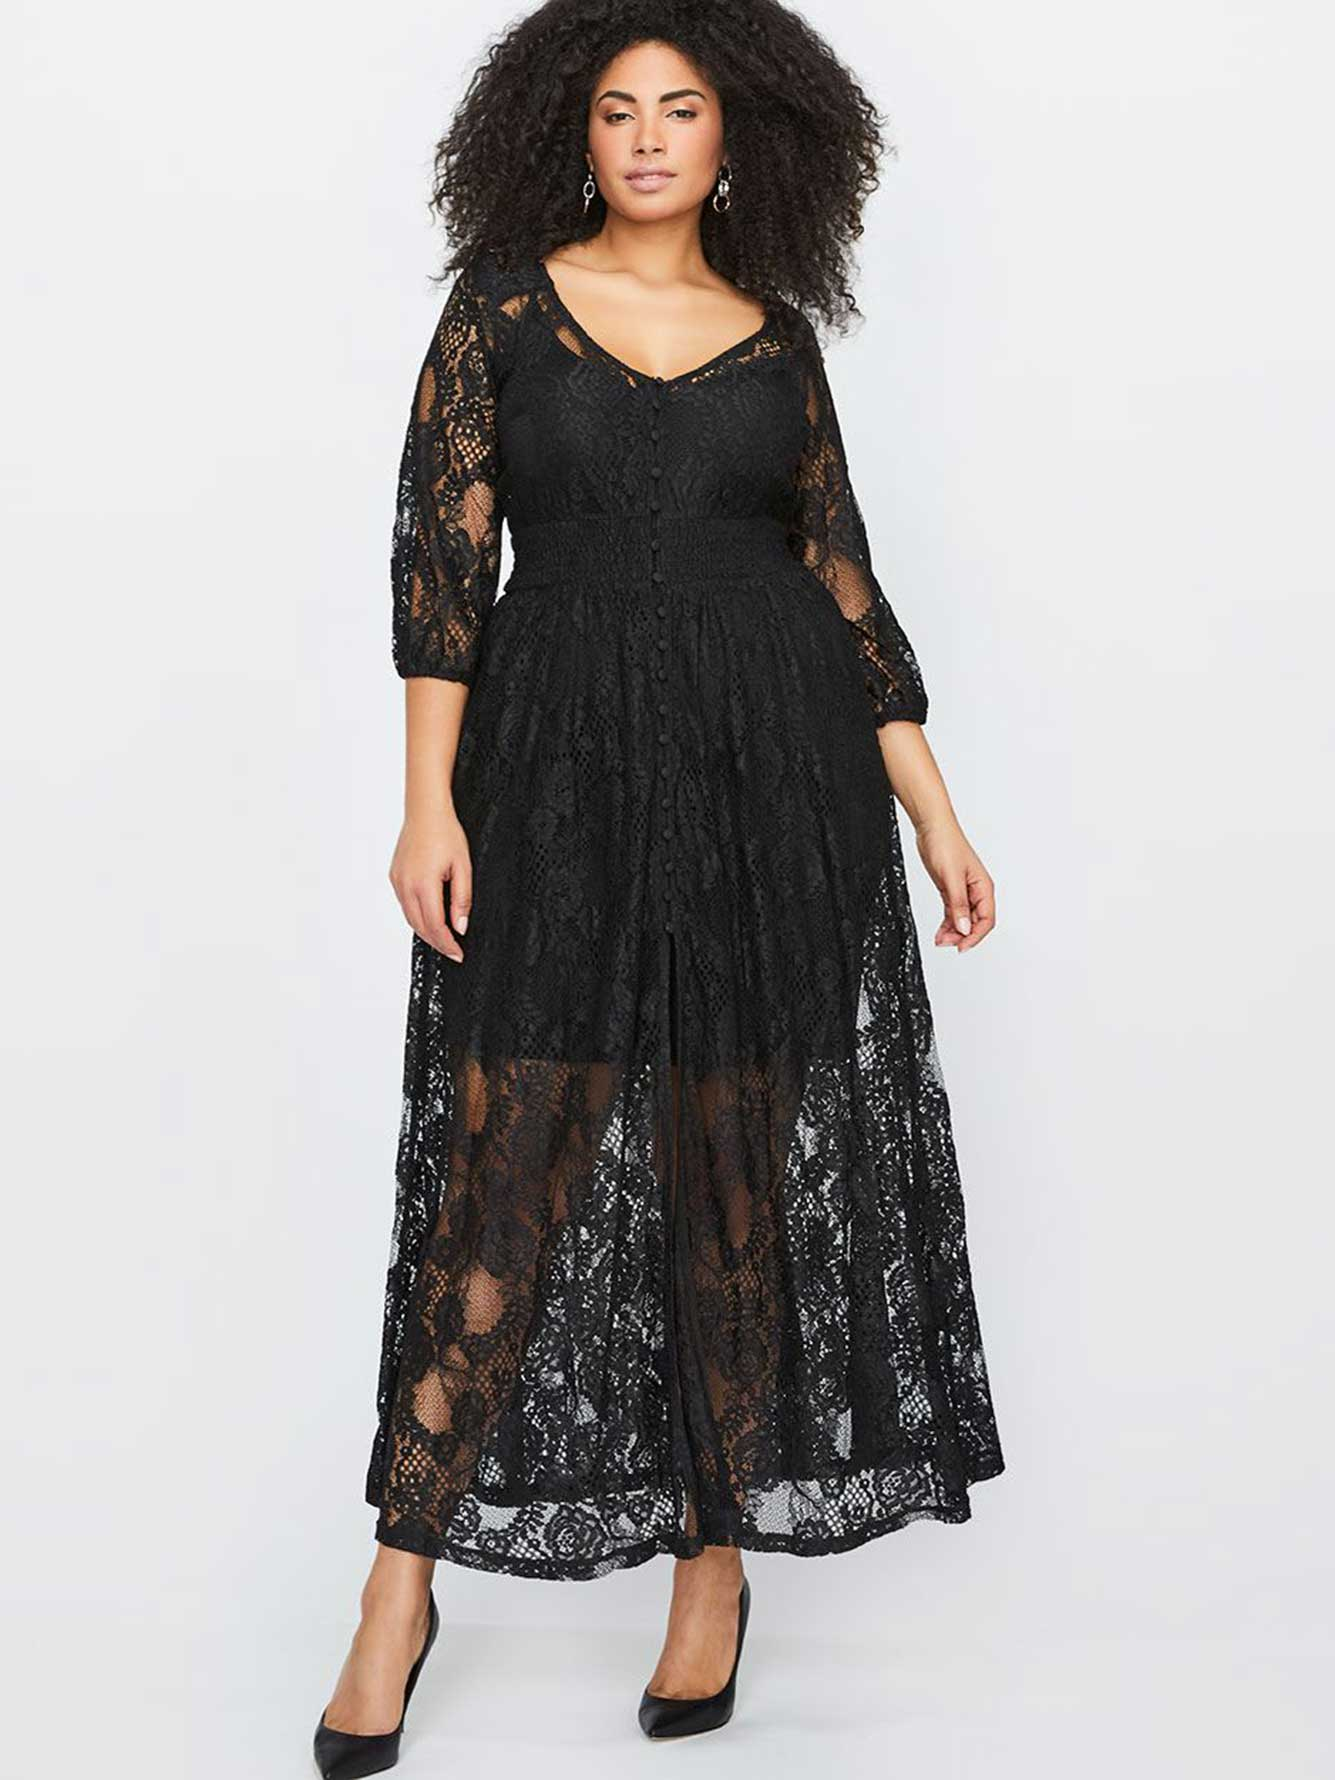 City chic black lace dress